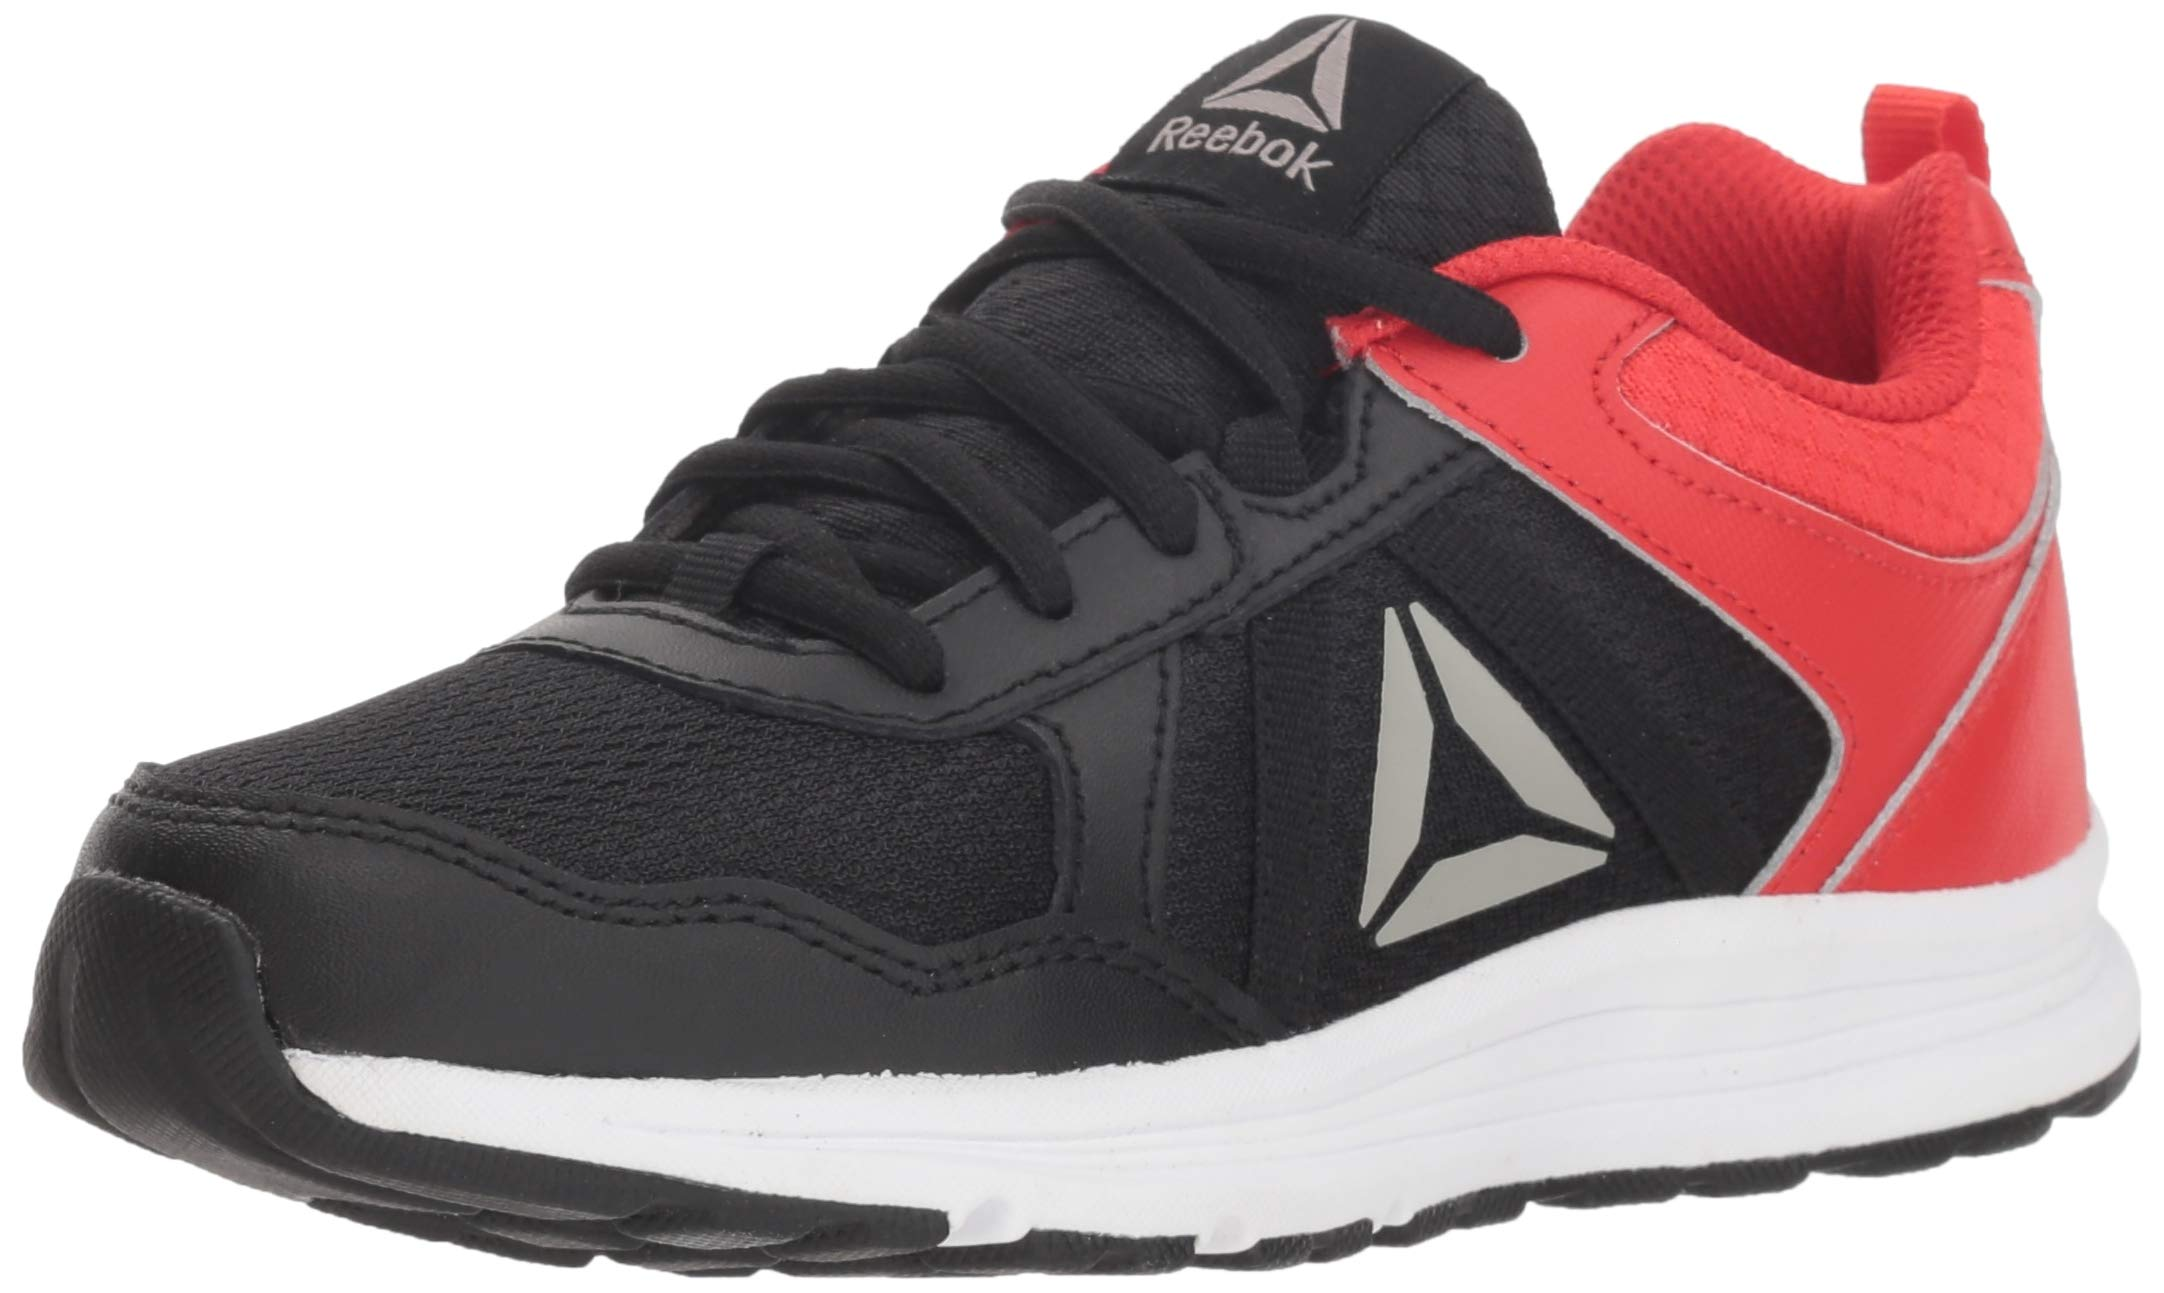 Reebok Unisex Almotio 4.0 Sneaker, Black/Primal